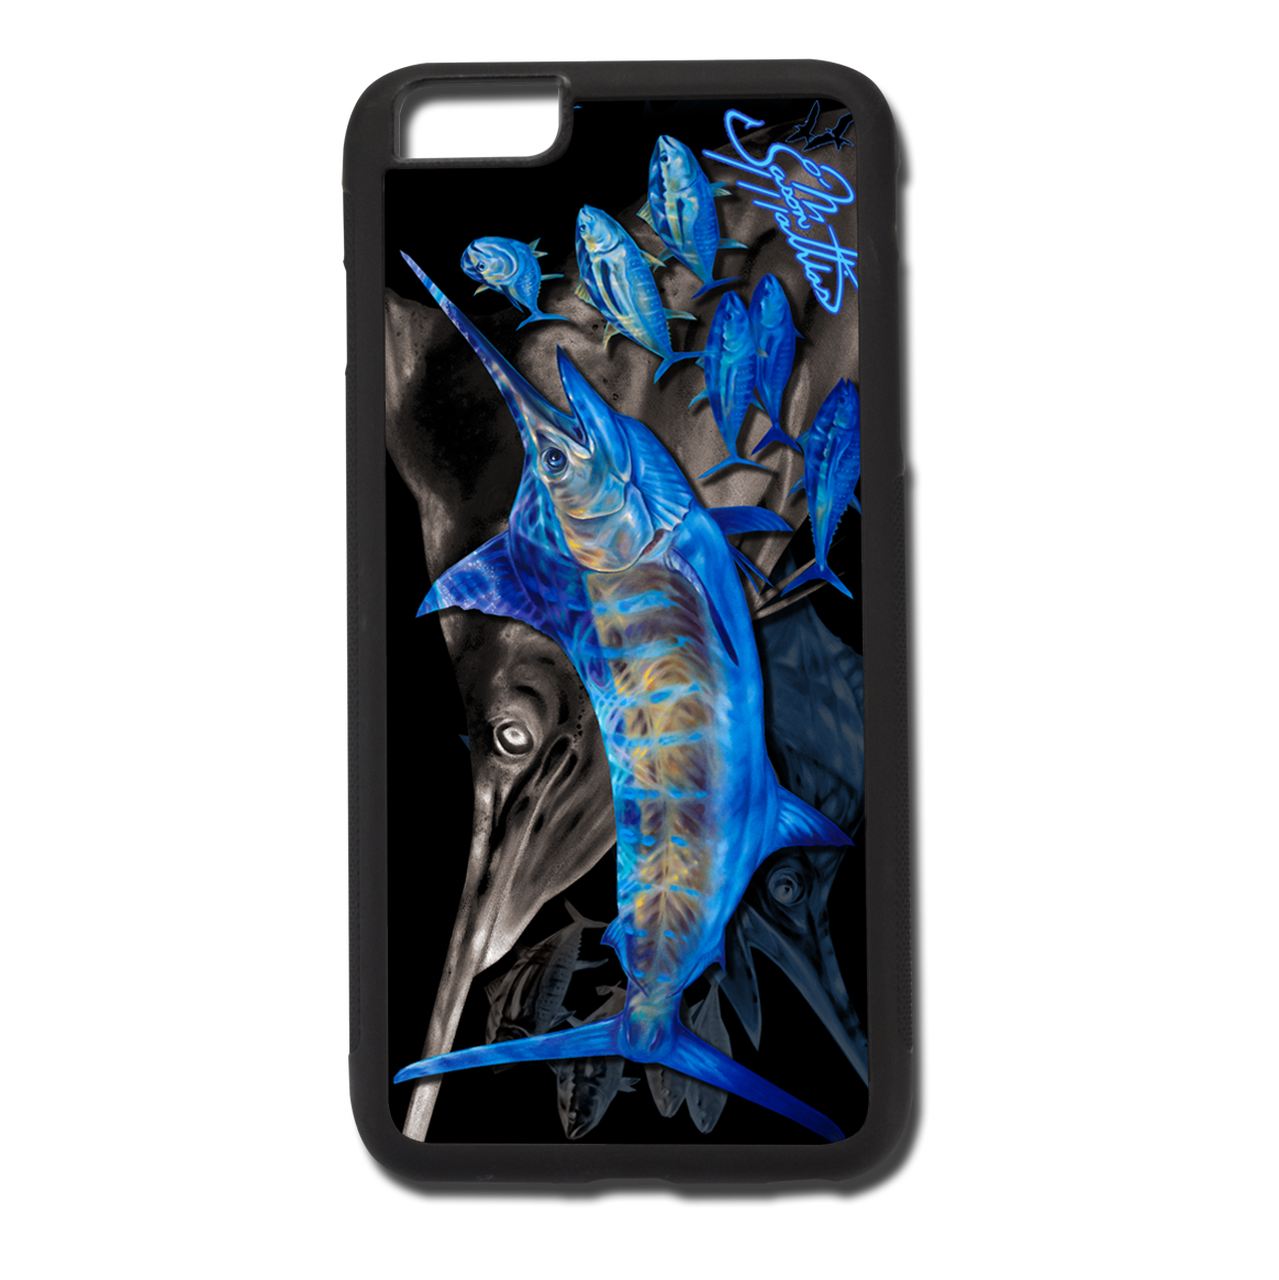 blue-marlin-iphone-case-cover-jason-mathias-art.png